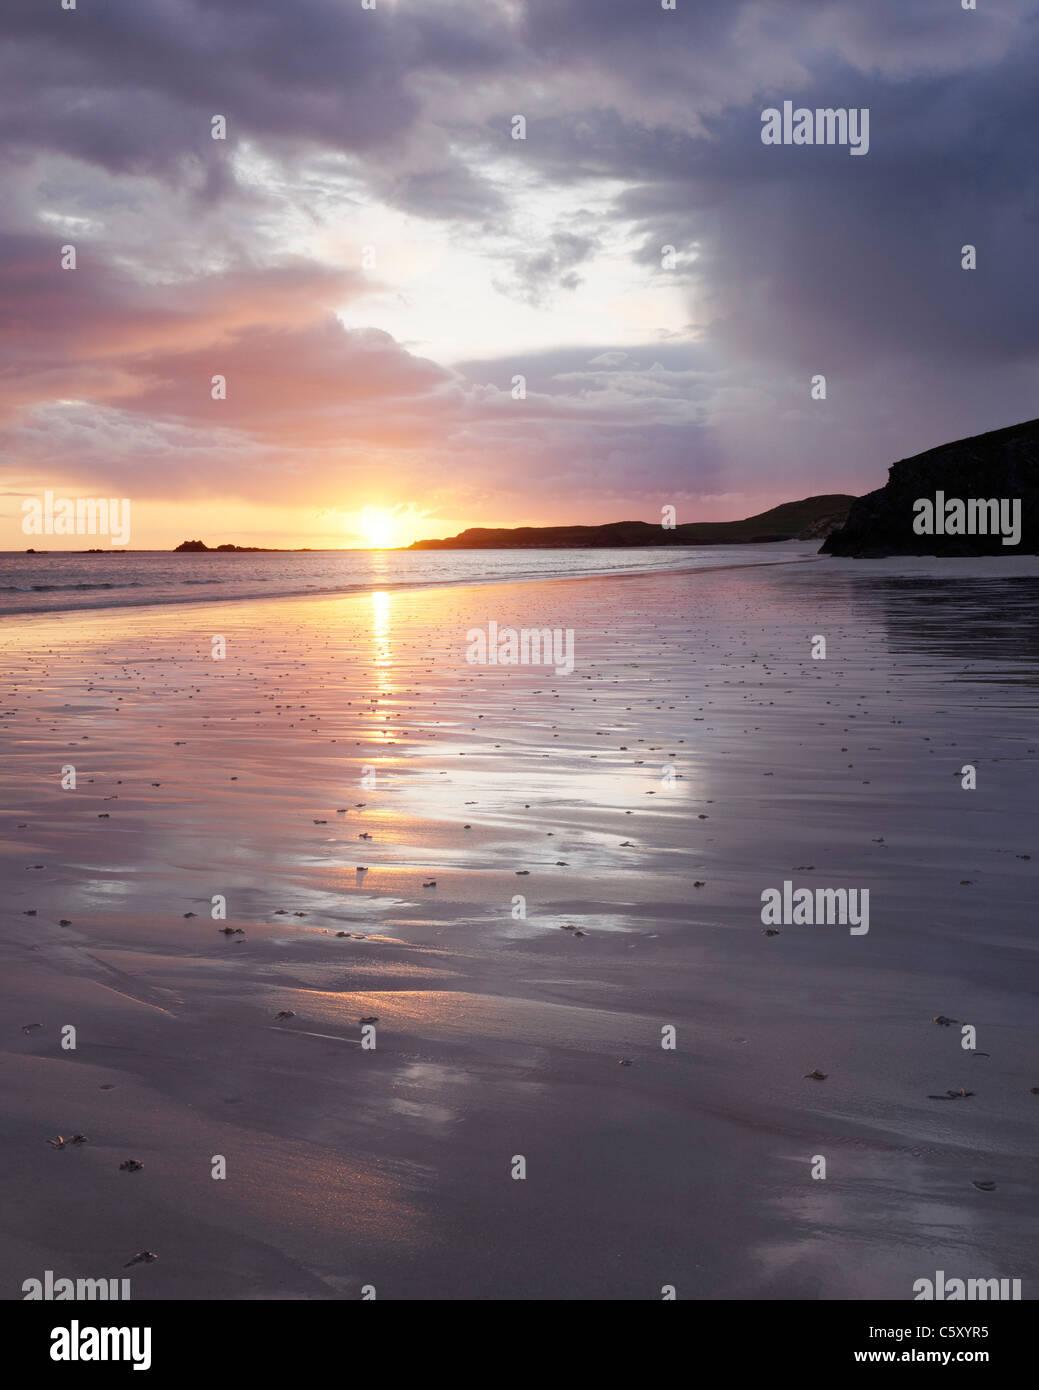 Sunset at Balnakiel Bay, near Durness, Sutherland, Highland, Scotland, UK. Stock Photo